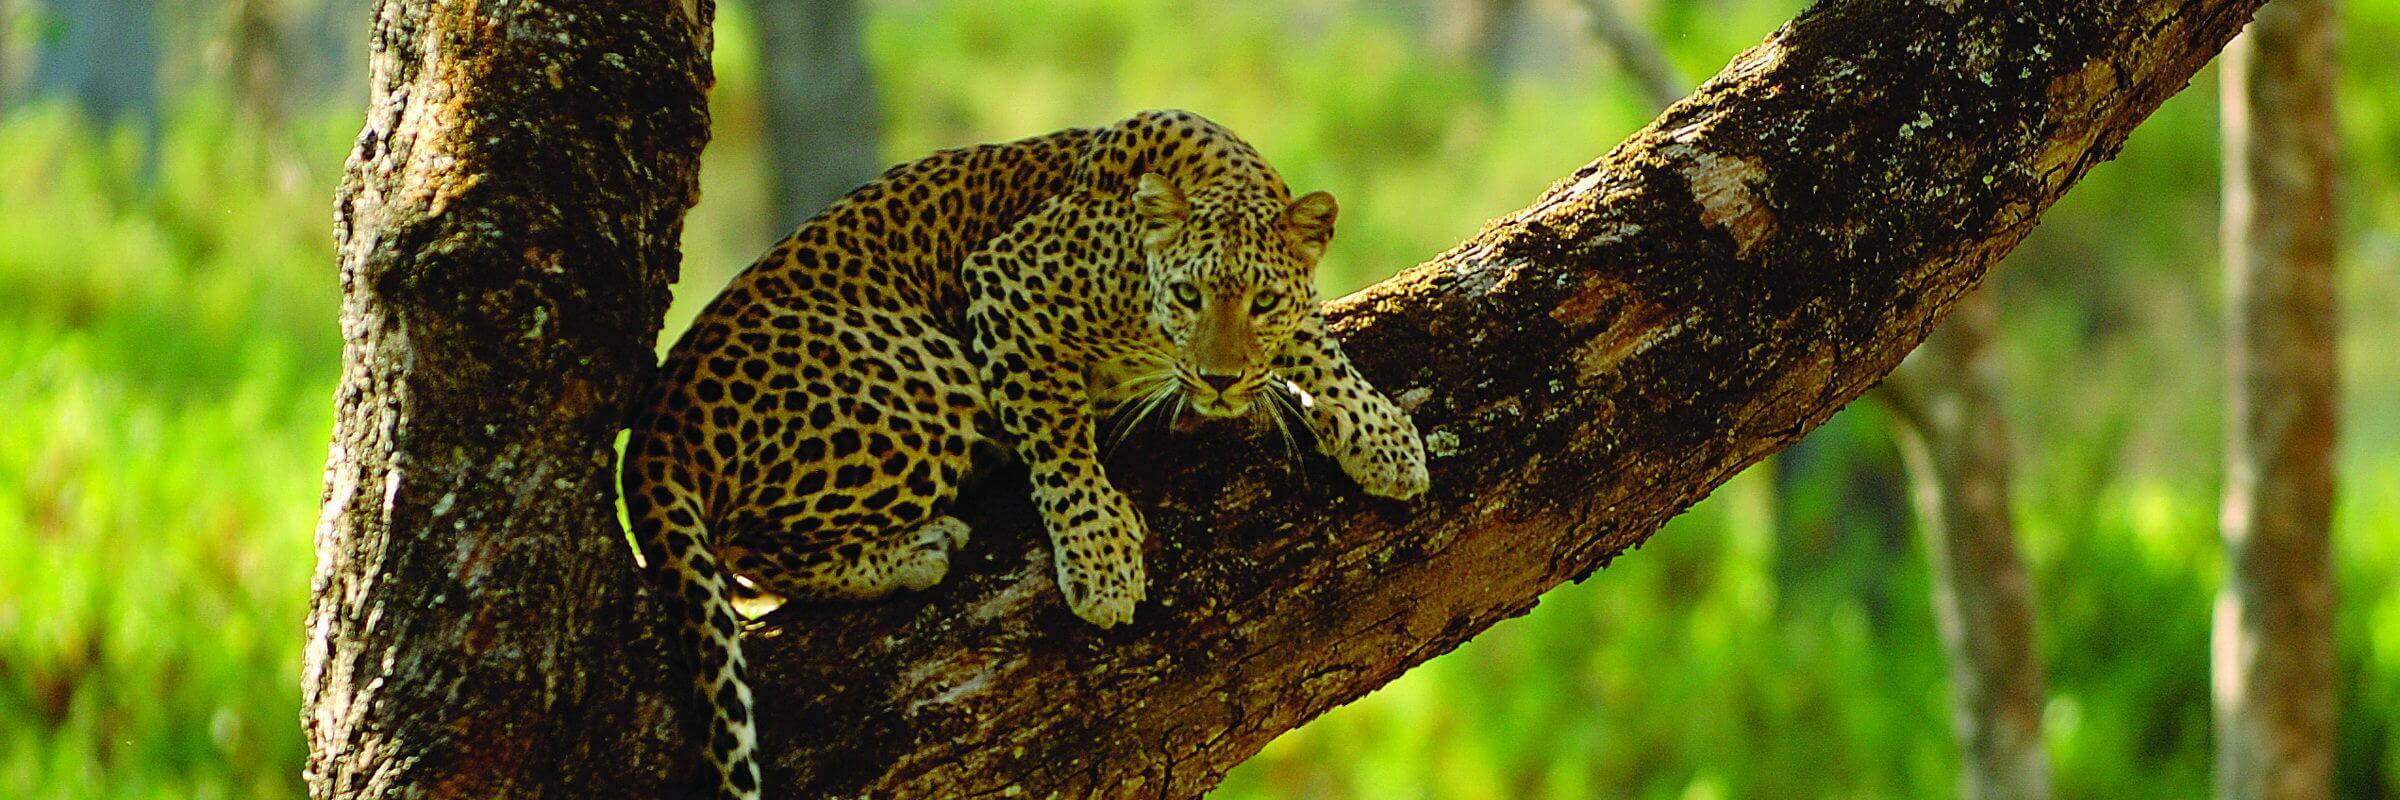 Nahaufnahme eines Leoparden im Nagarhole Nationalpark Kabini